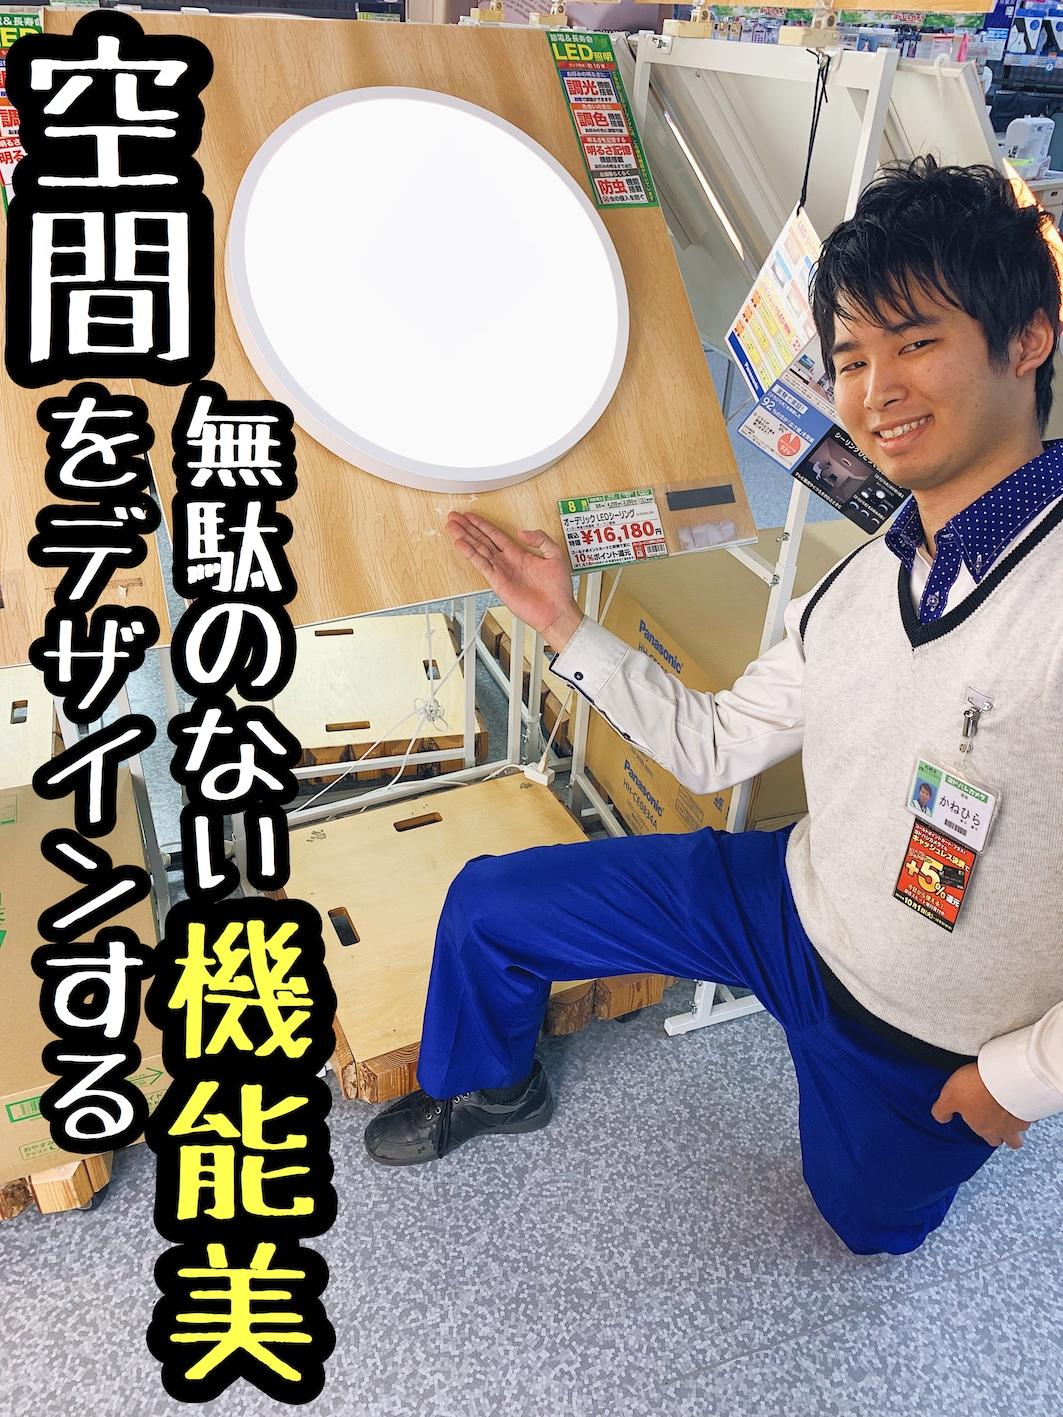 http://image.yodobashi.com/promotion/a/11843/200000017500068020/SD_200000017500068020510B1.jpg